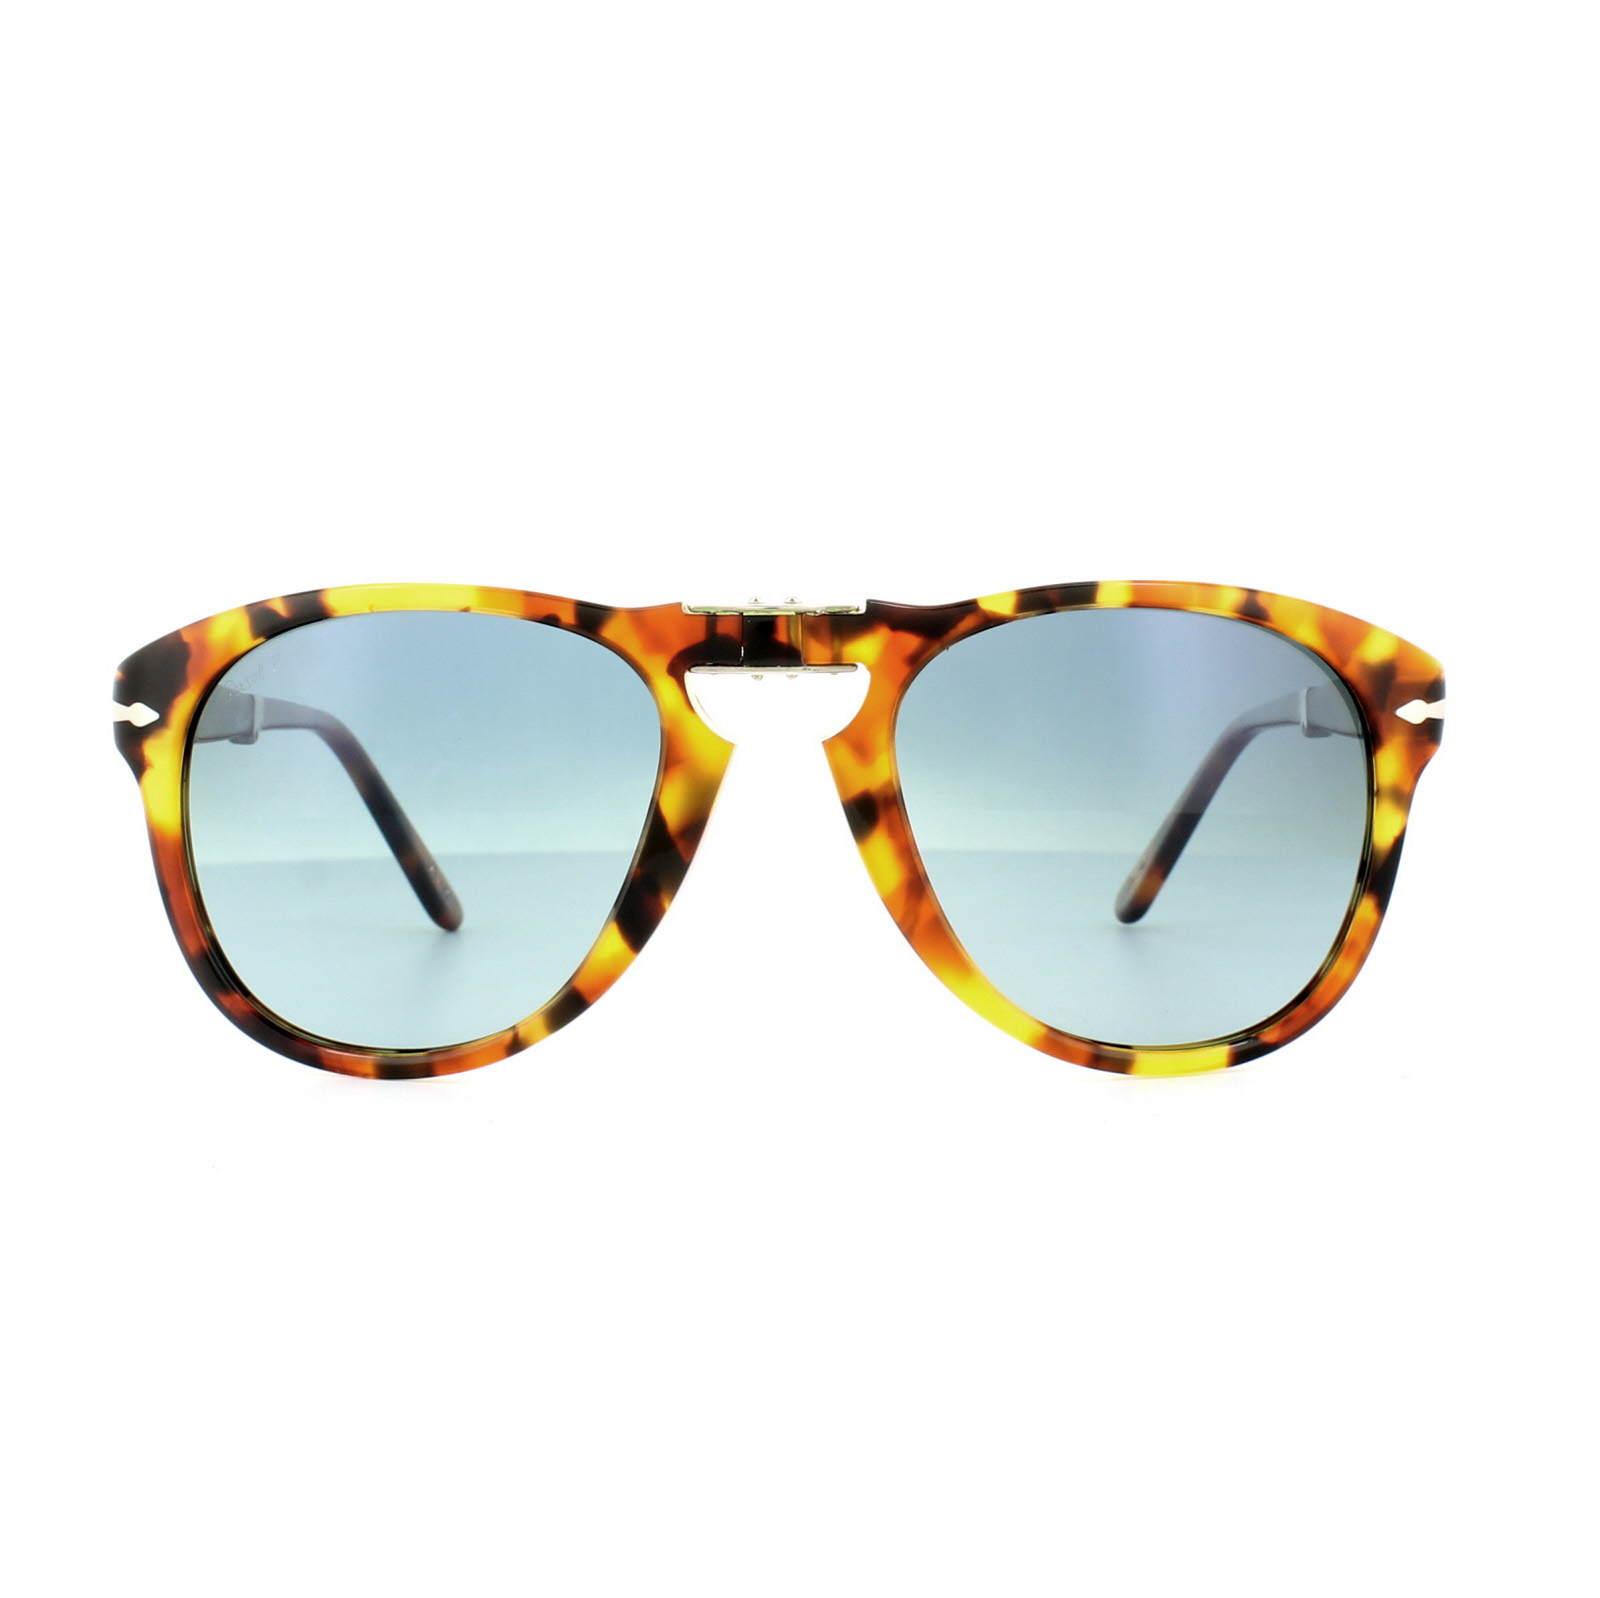 61d305bb25 Sentinel Persol Sunglasses 0714 1052S3 Madreterra Dark Blue Gradient  Polarized